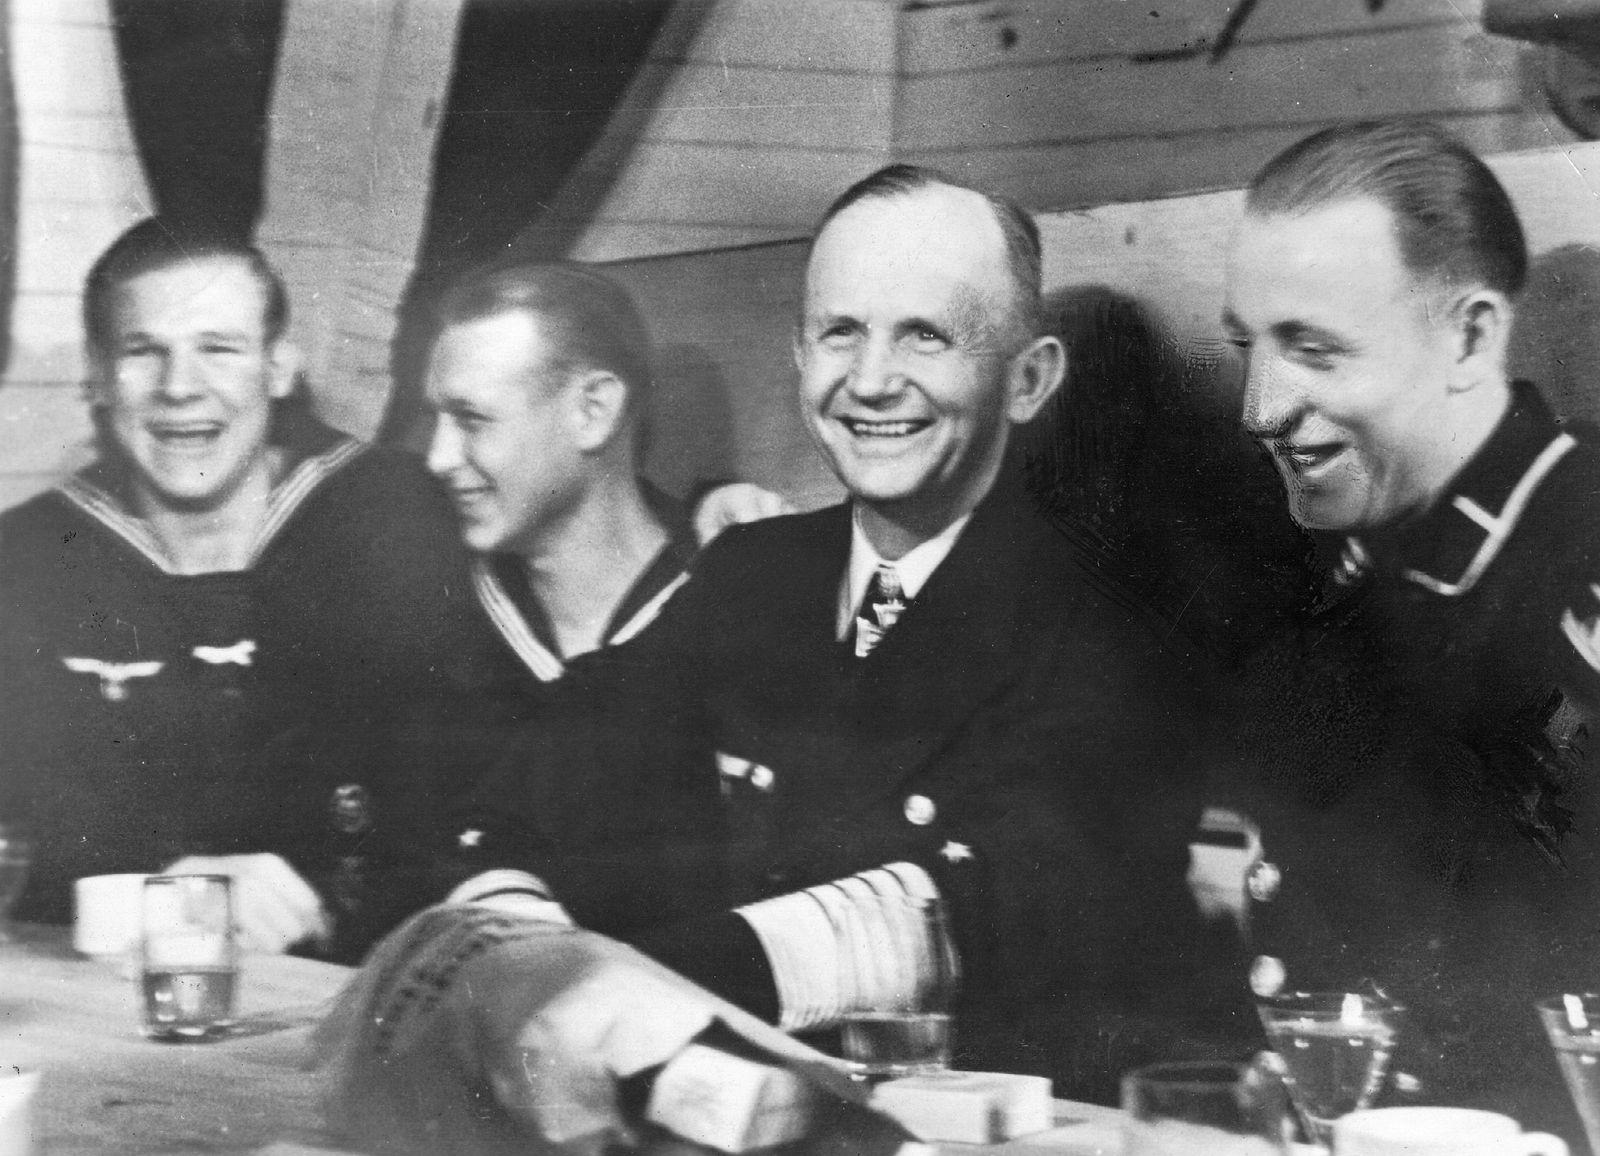 Karl Dönitz mit Matrosen, 1945